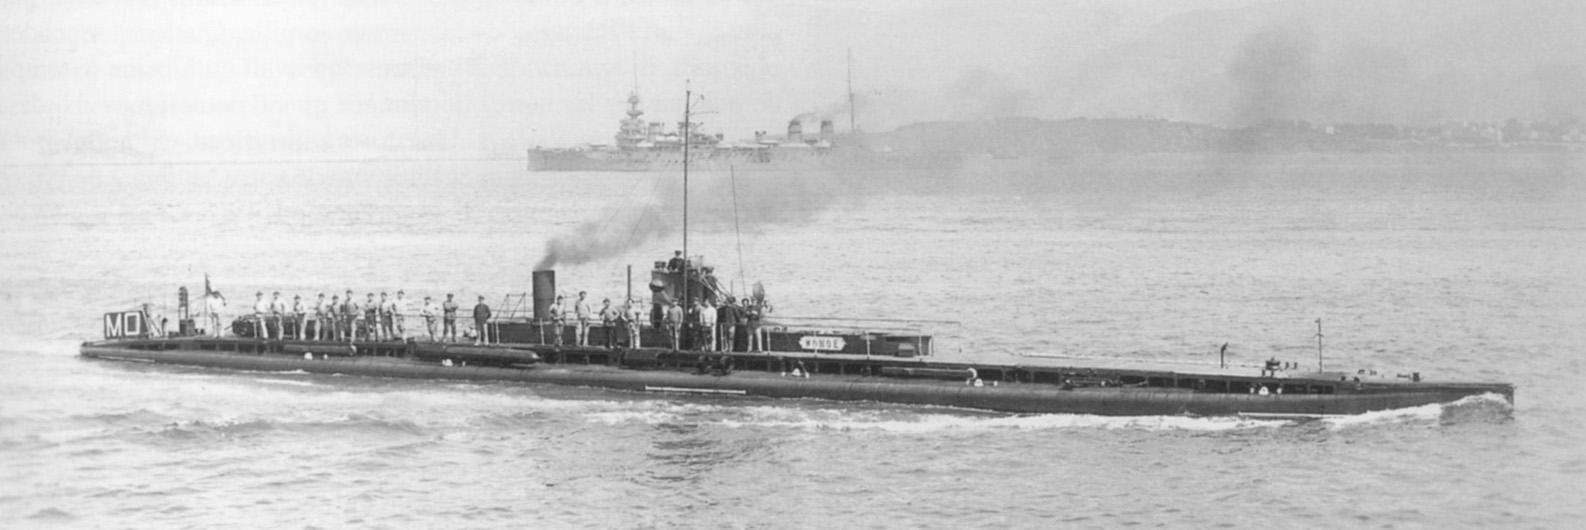 Monge (sous-marin vapeur) off Toulon 1914.jpg